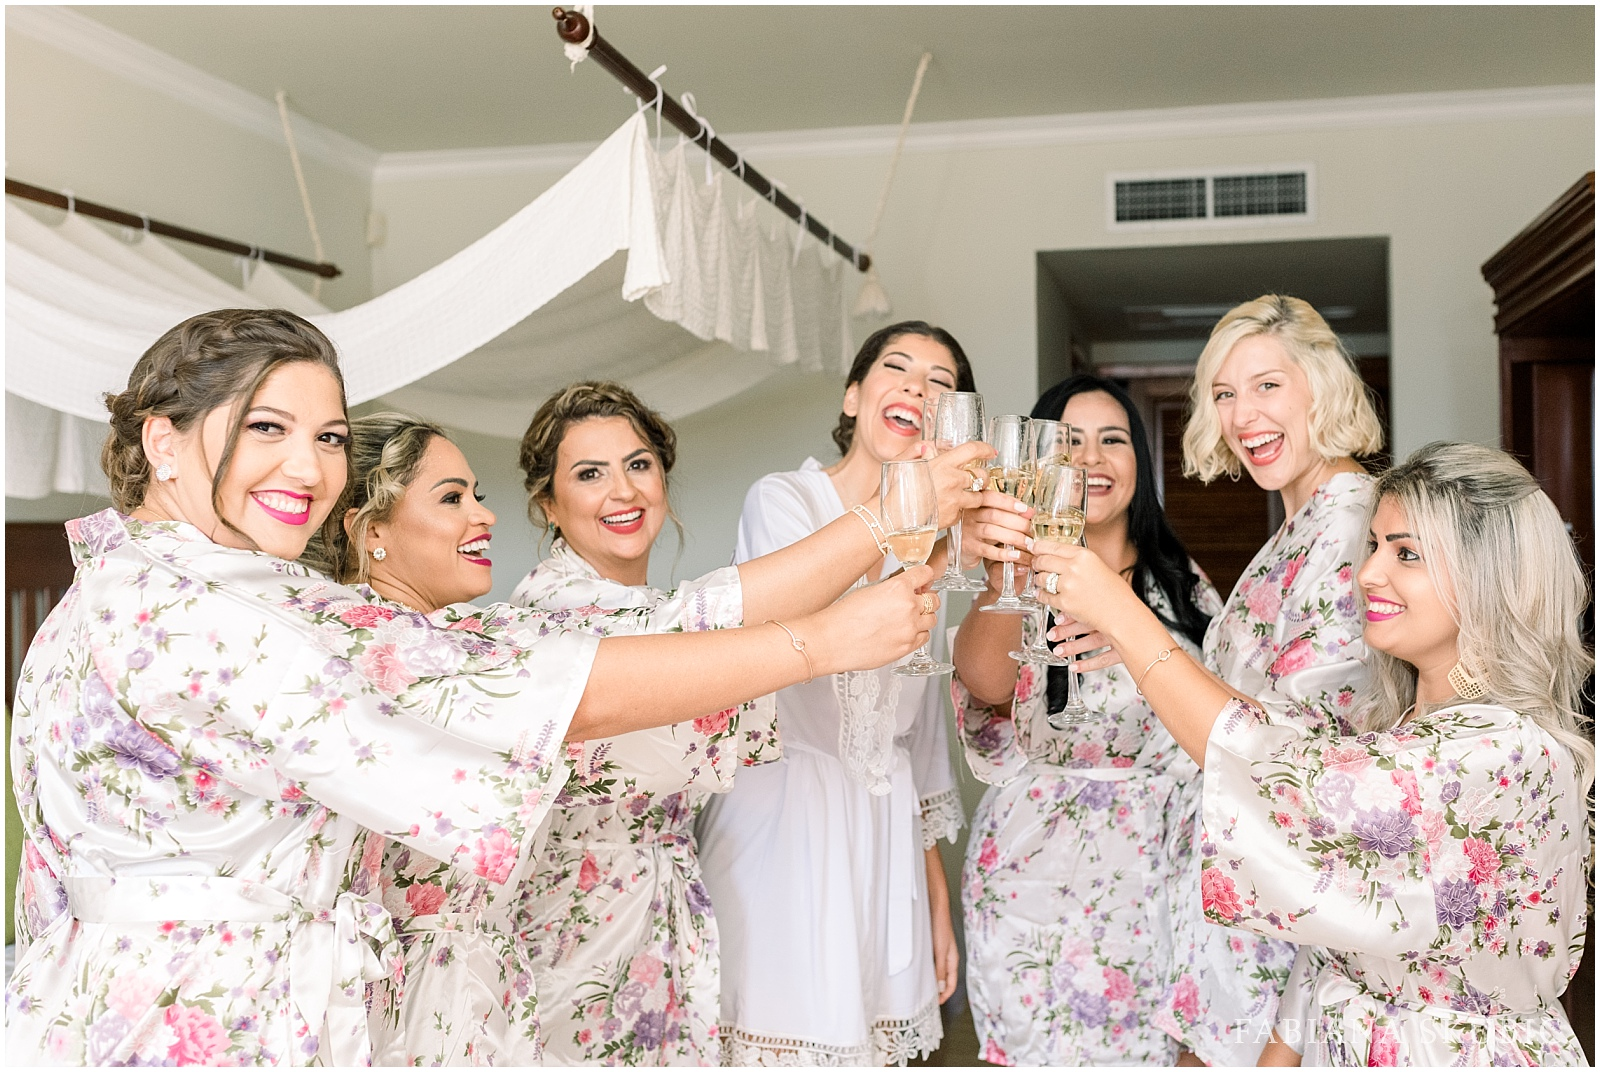 TJ_Now_Sapphire_Riviera_Cancun_Mexico_Wedding_Photos_0155.jpg